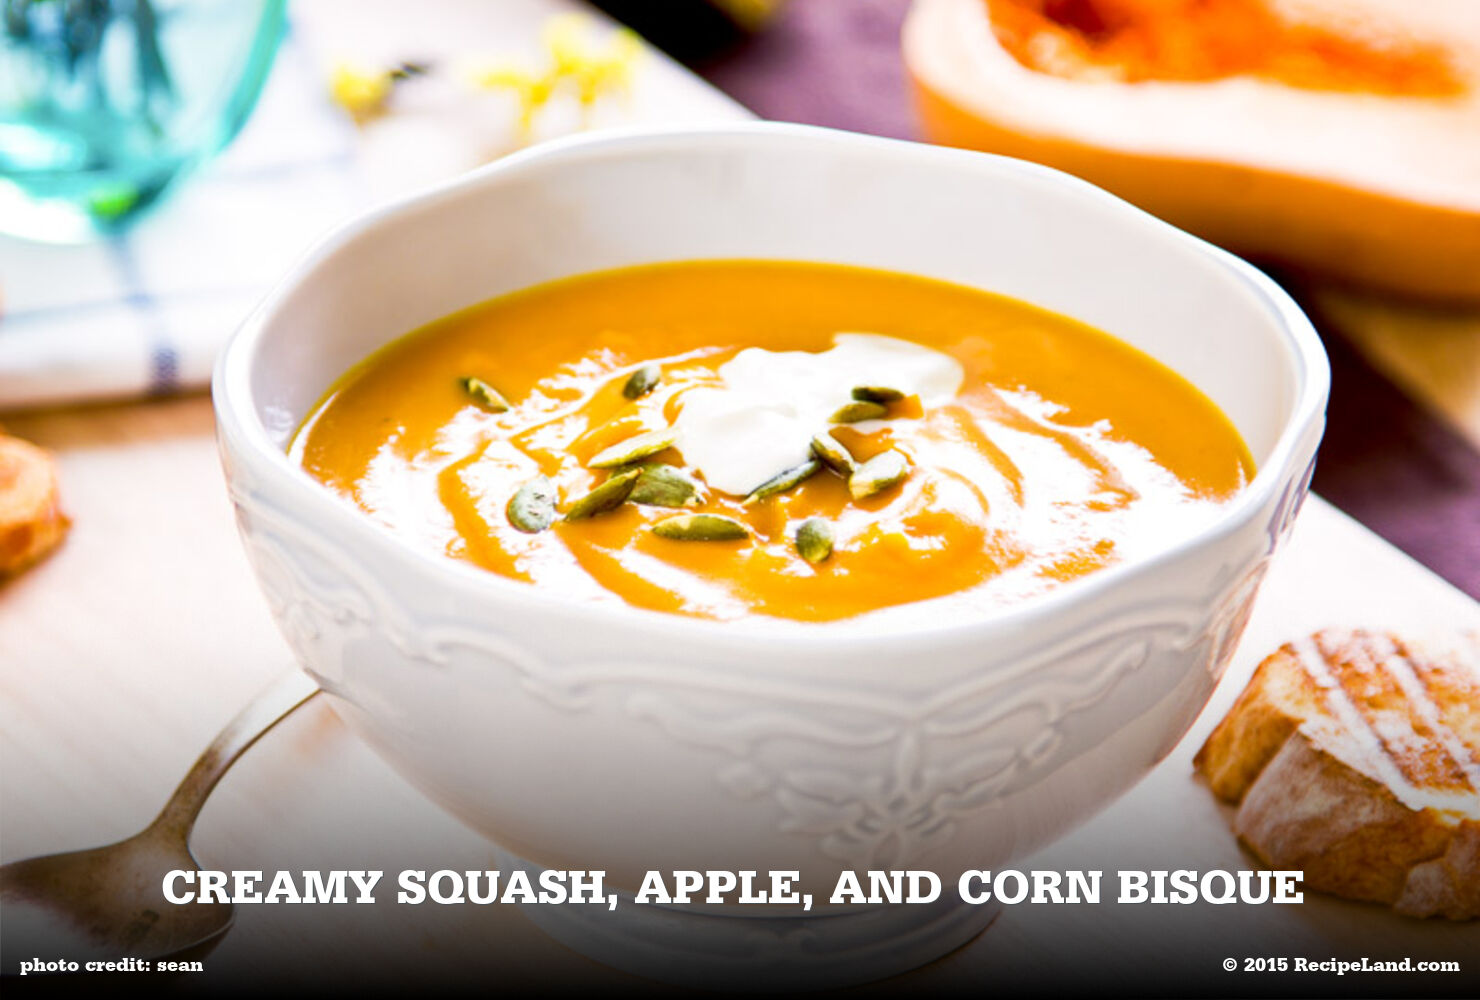 Creamy Squash, Apple, and Corn Bisque